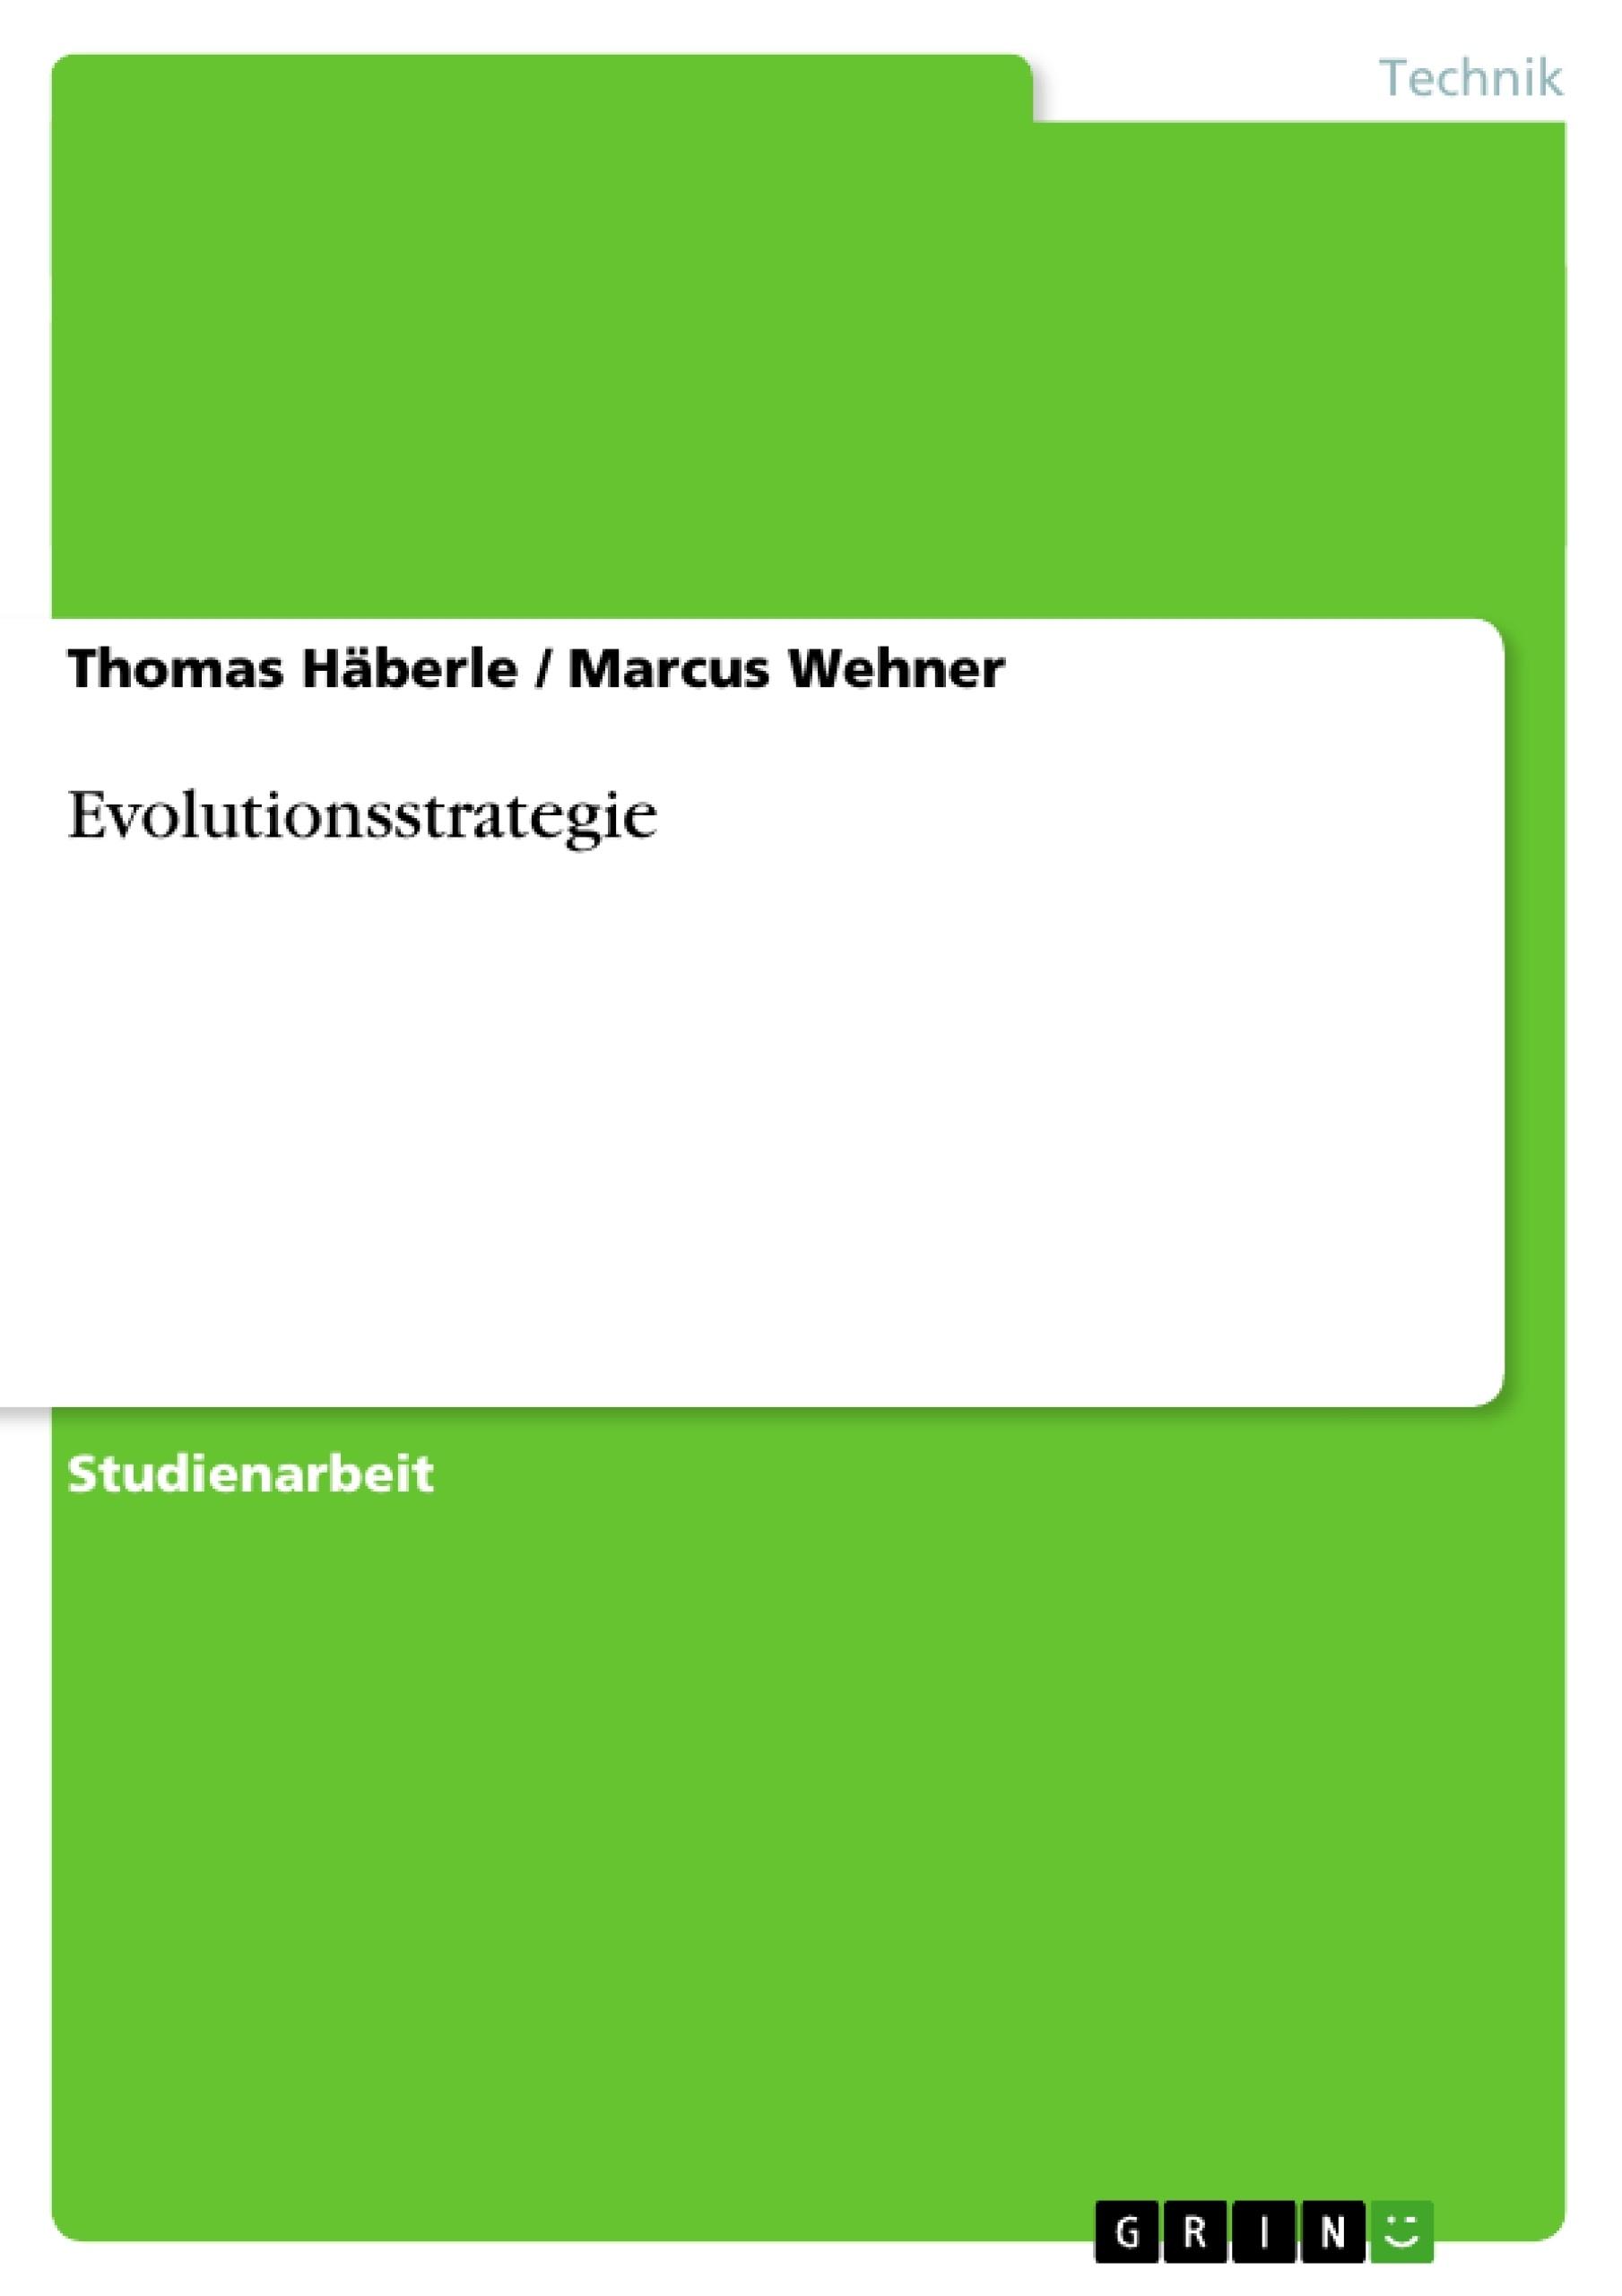 Titel: Evolutionsstrategie